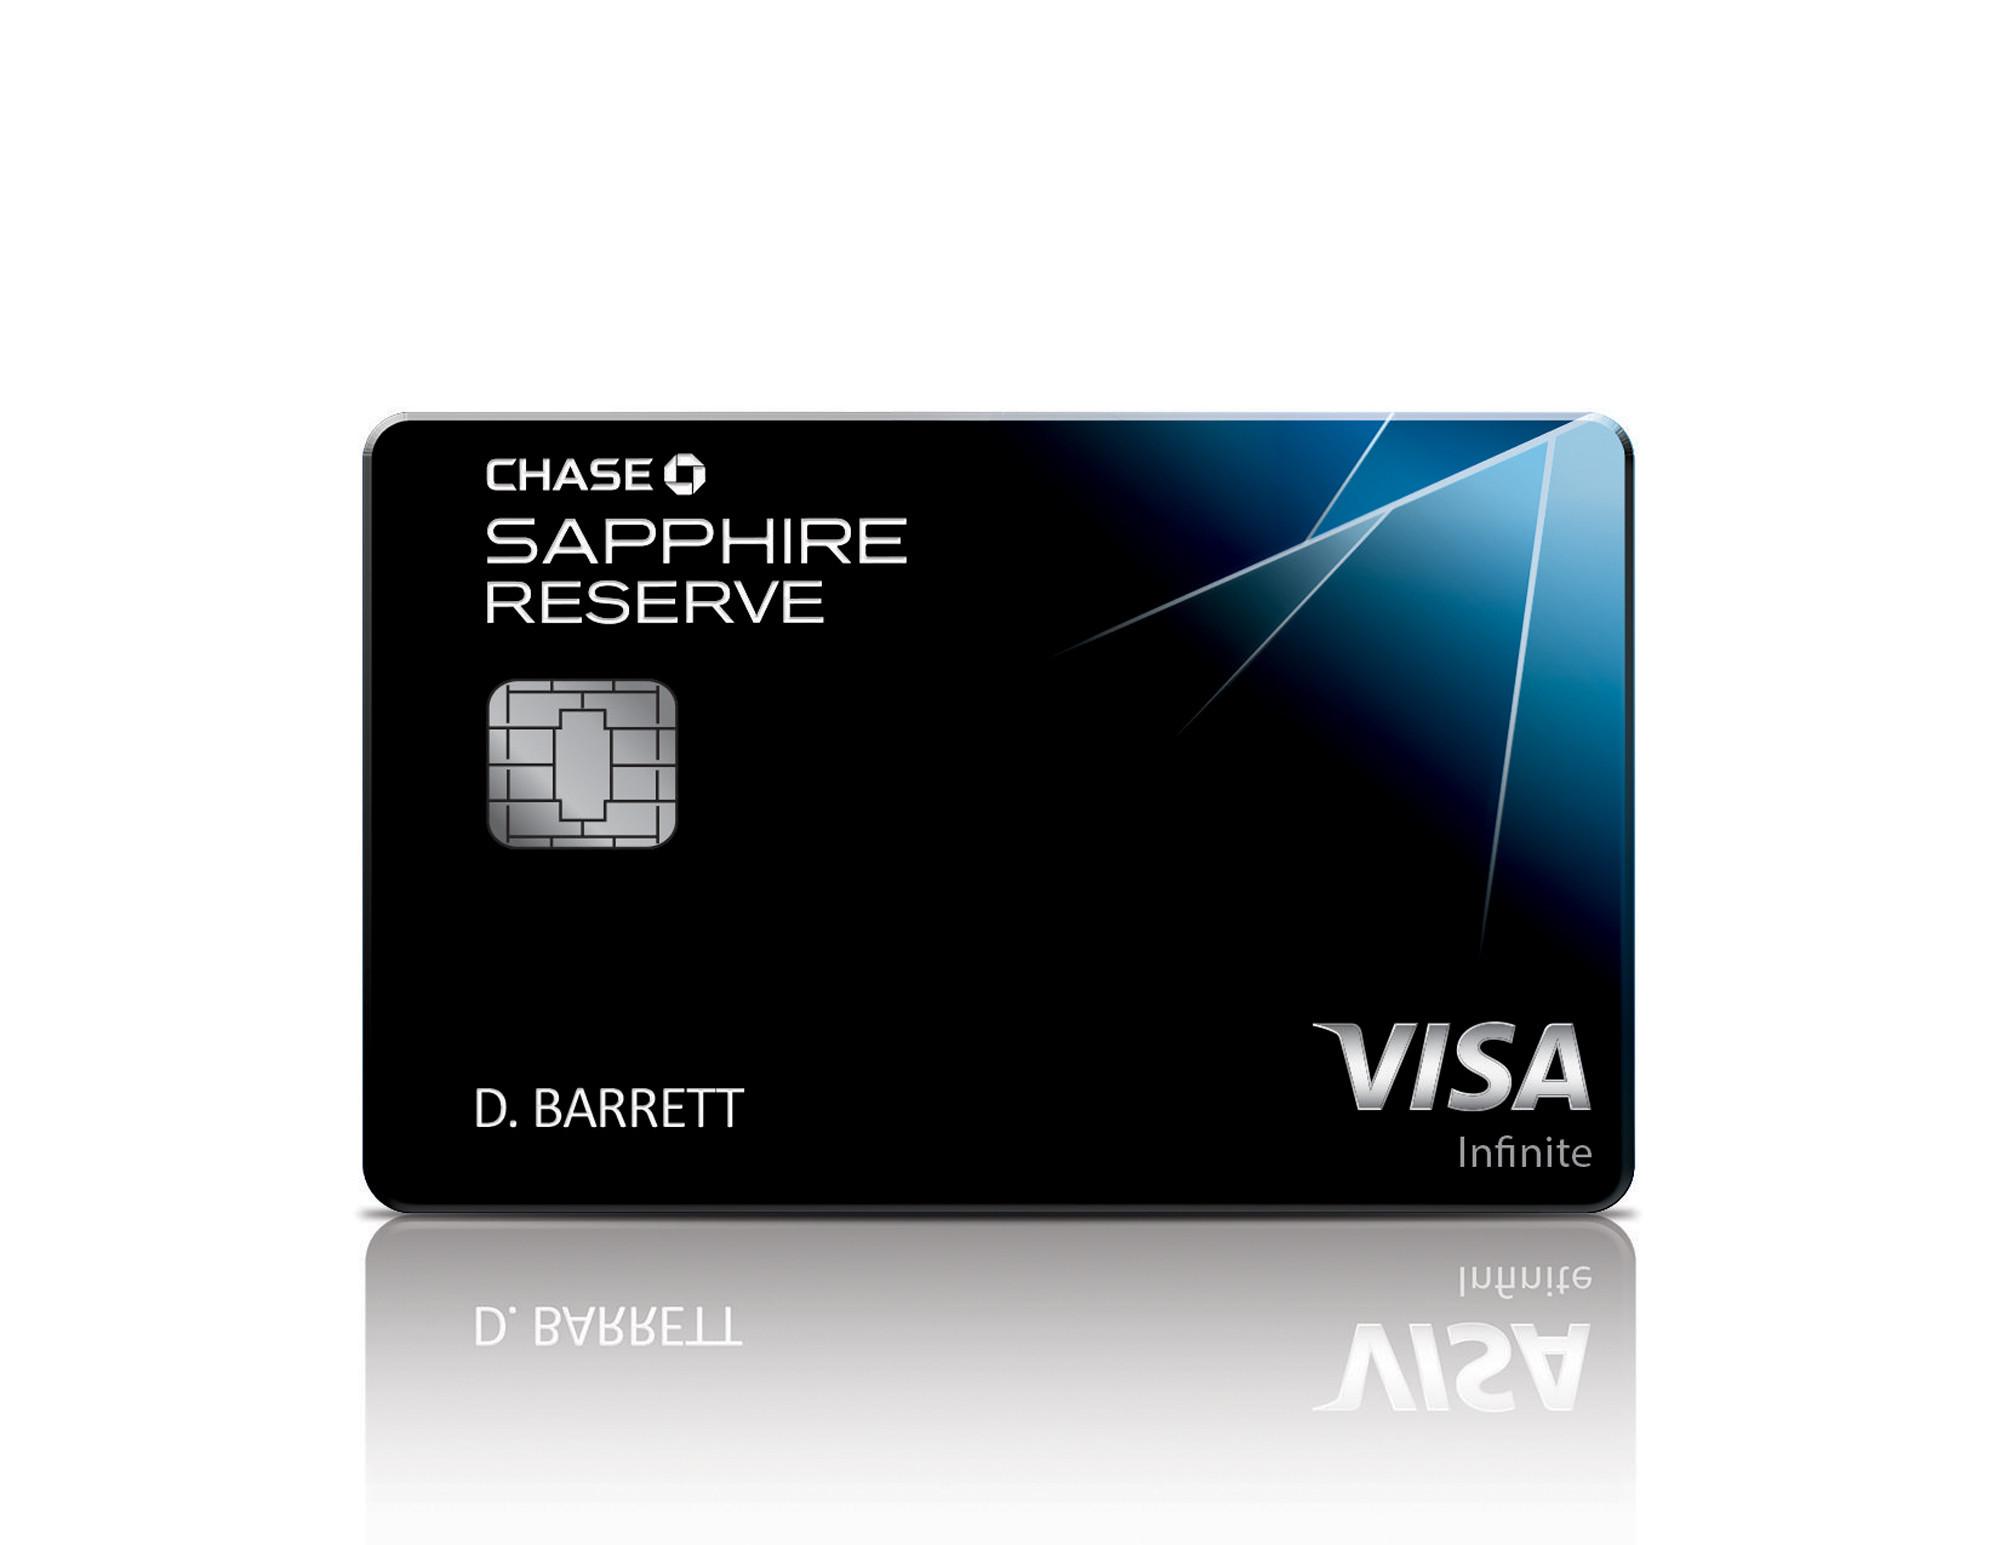 credit card sensation the hottest new plastic is metal chicago tribune - Metal Visa Card